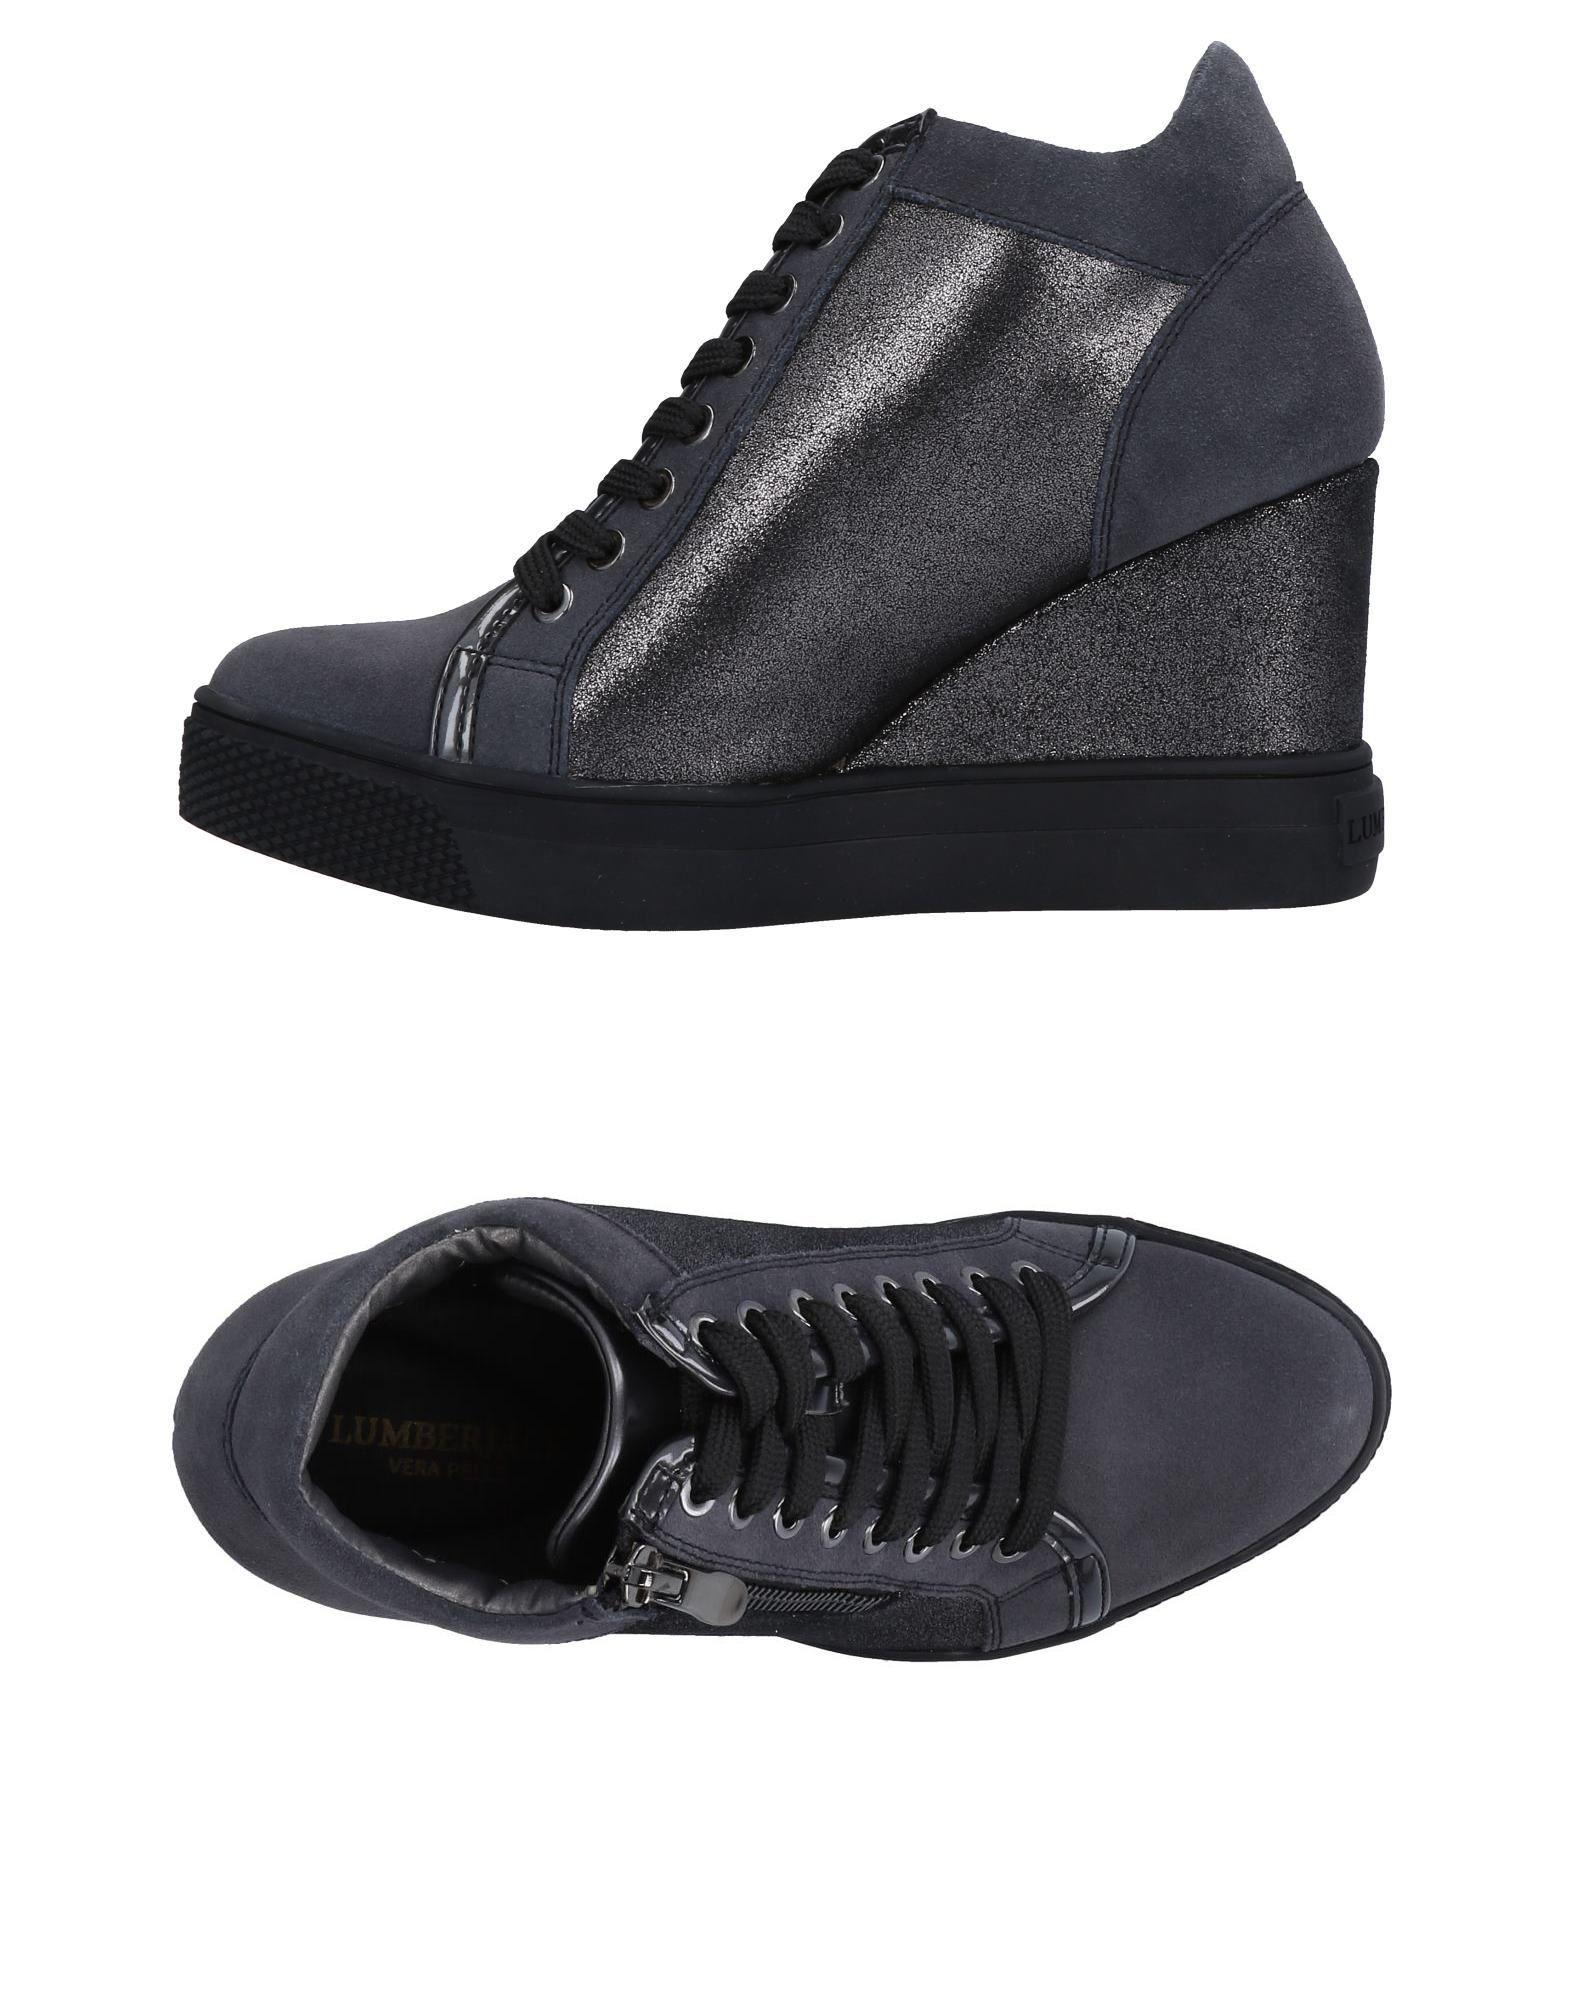 Lumberjack Sneakers Damen  11505823OL Schuhe Gute Qualität beliebte Schuhe 11505823OL 4bffbd